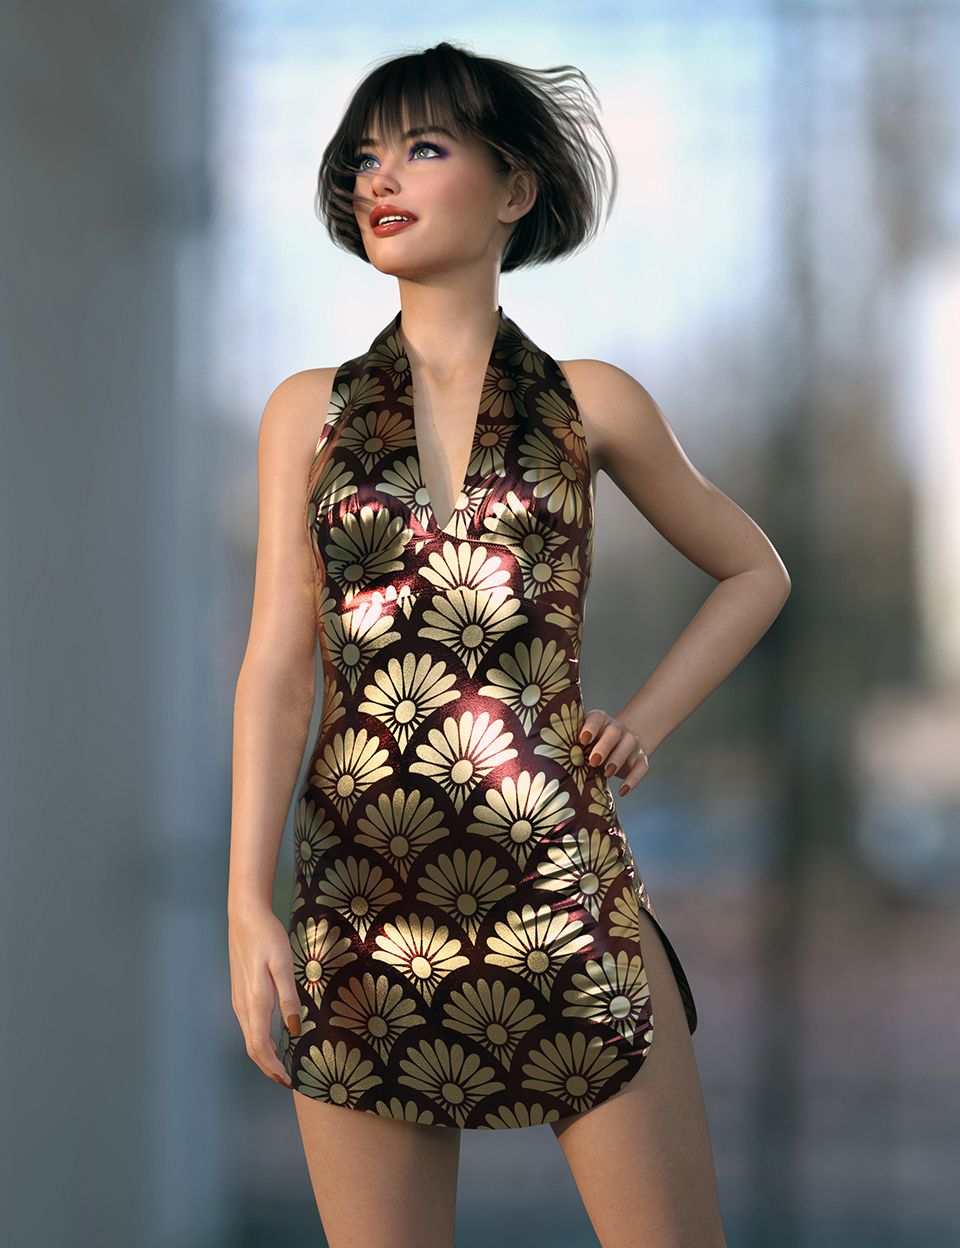 dForce Charlotte Club Dress for Genesis 8 Females by: Nelmi, 3D Models by Daz 3D